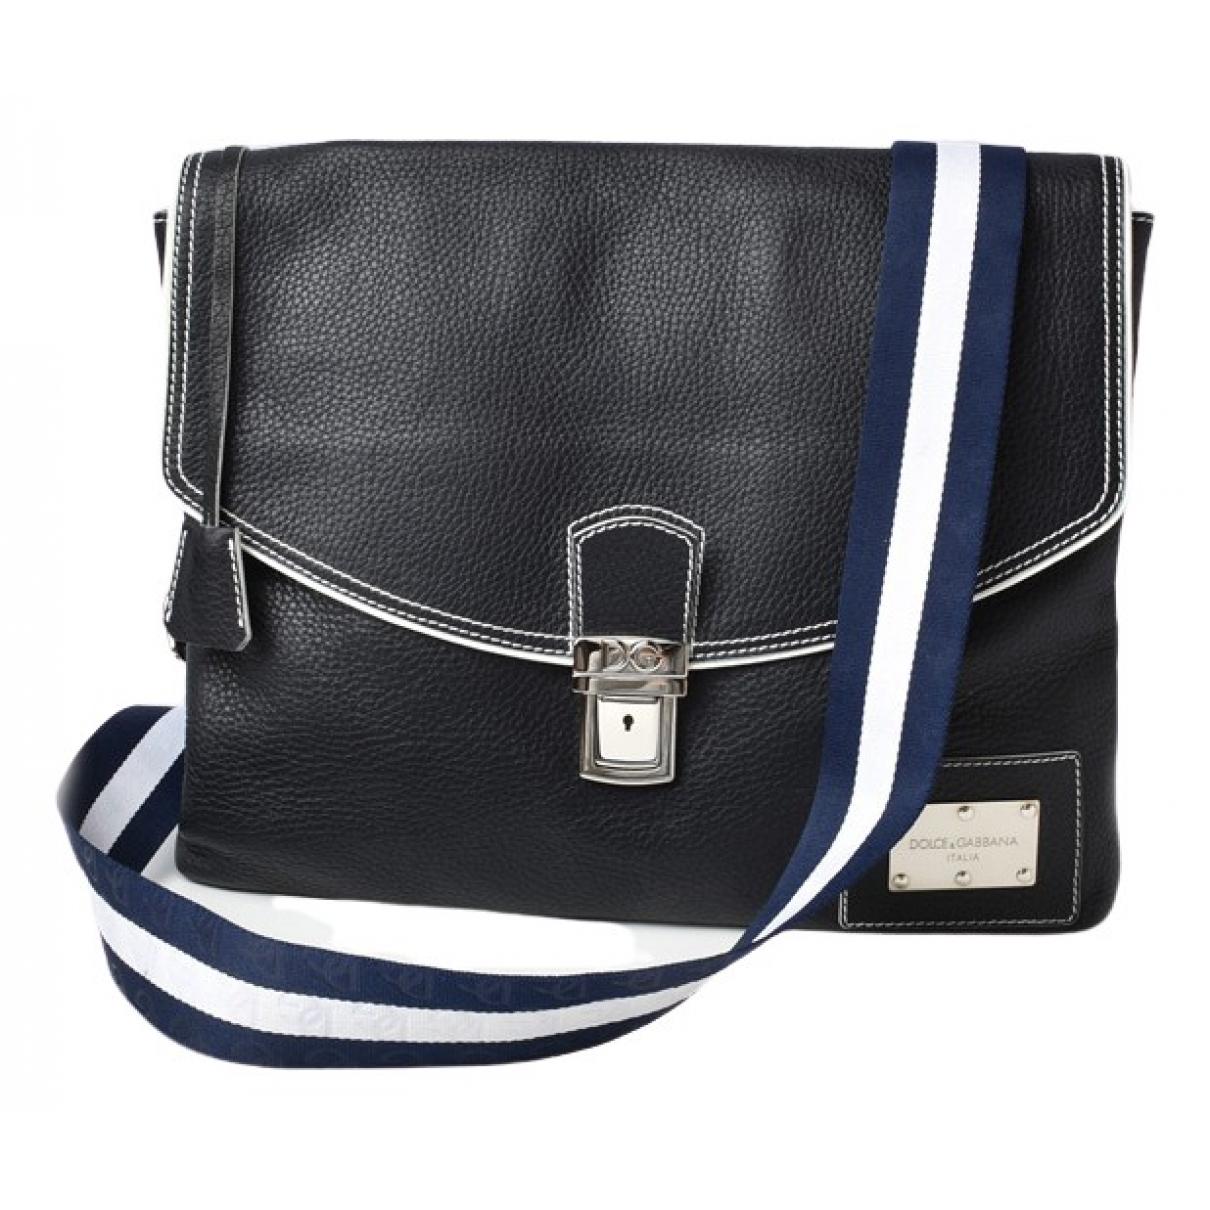 Dolce & Gabbana \N Navy Leather handbag for Women \N